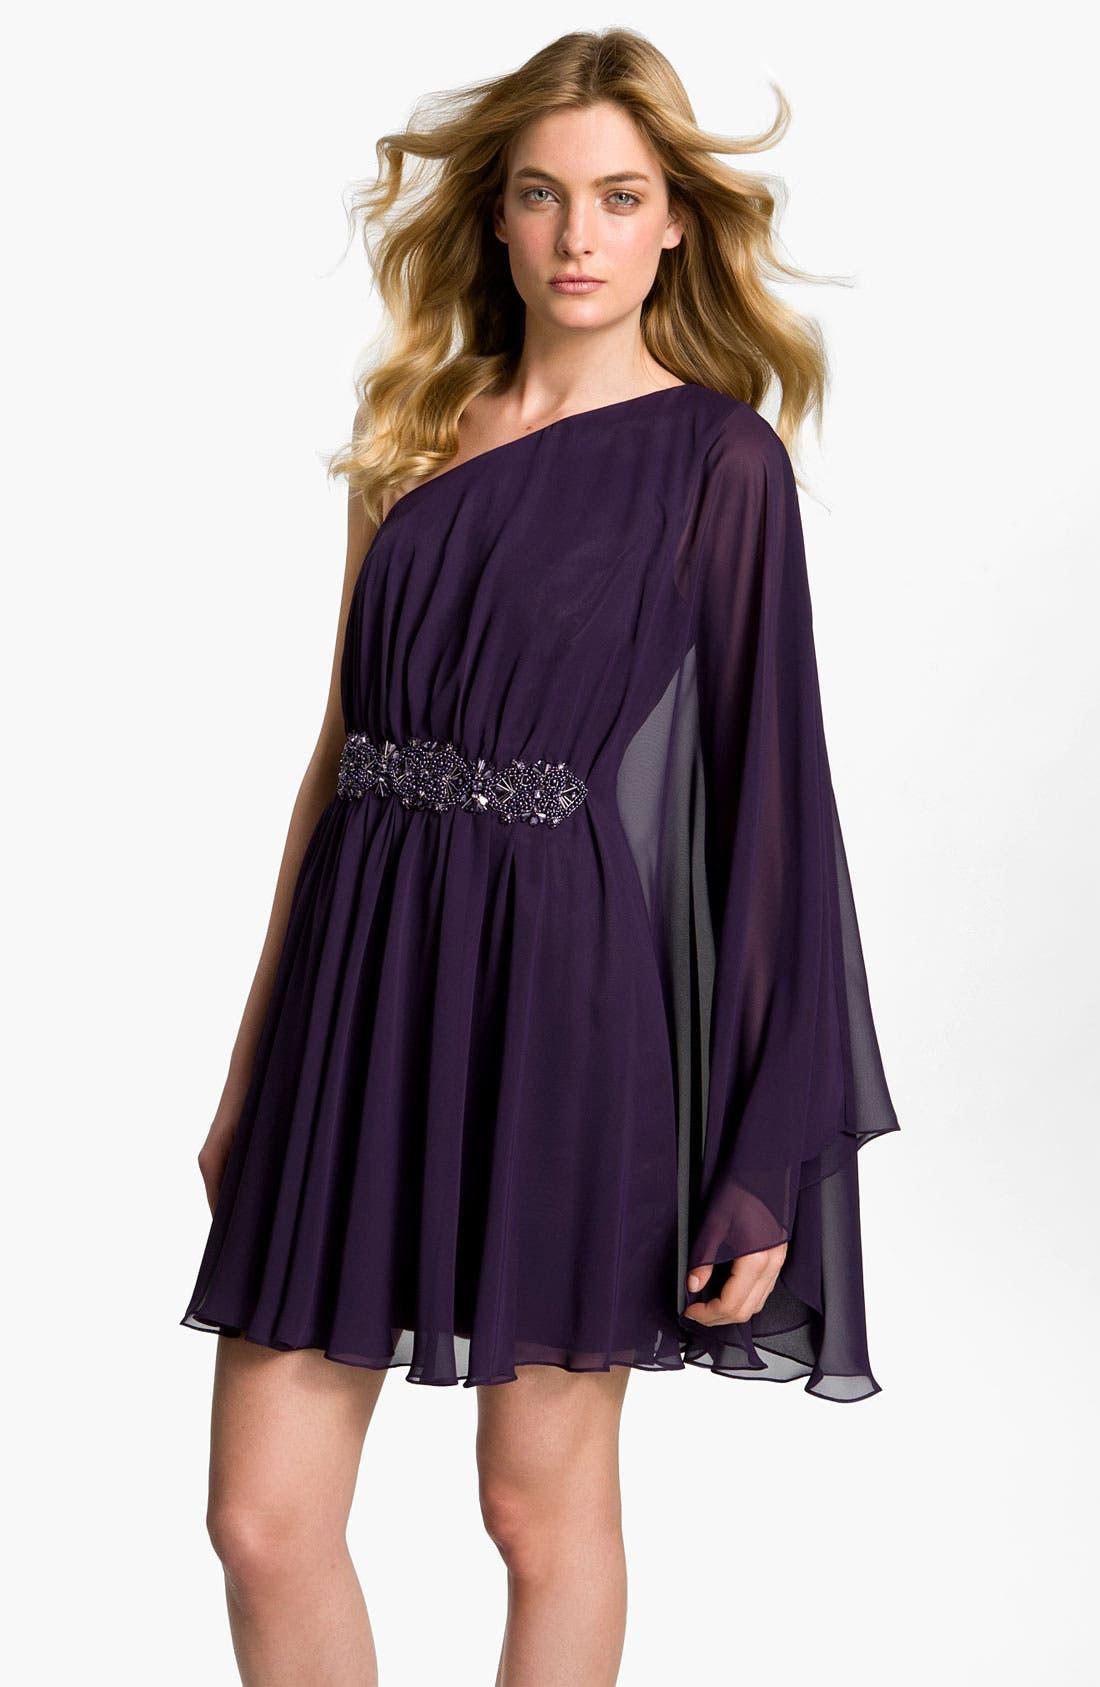 Alternate Image 1 Selected - JS Boutique Beaded Draped Chiffon Dress